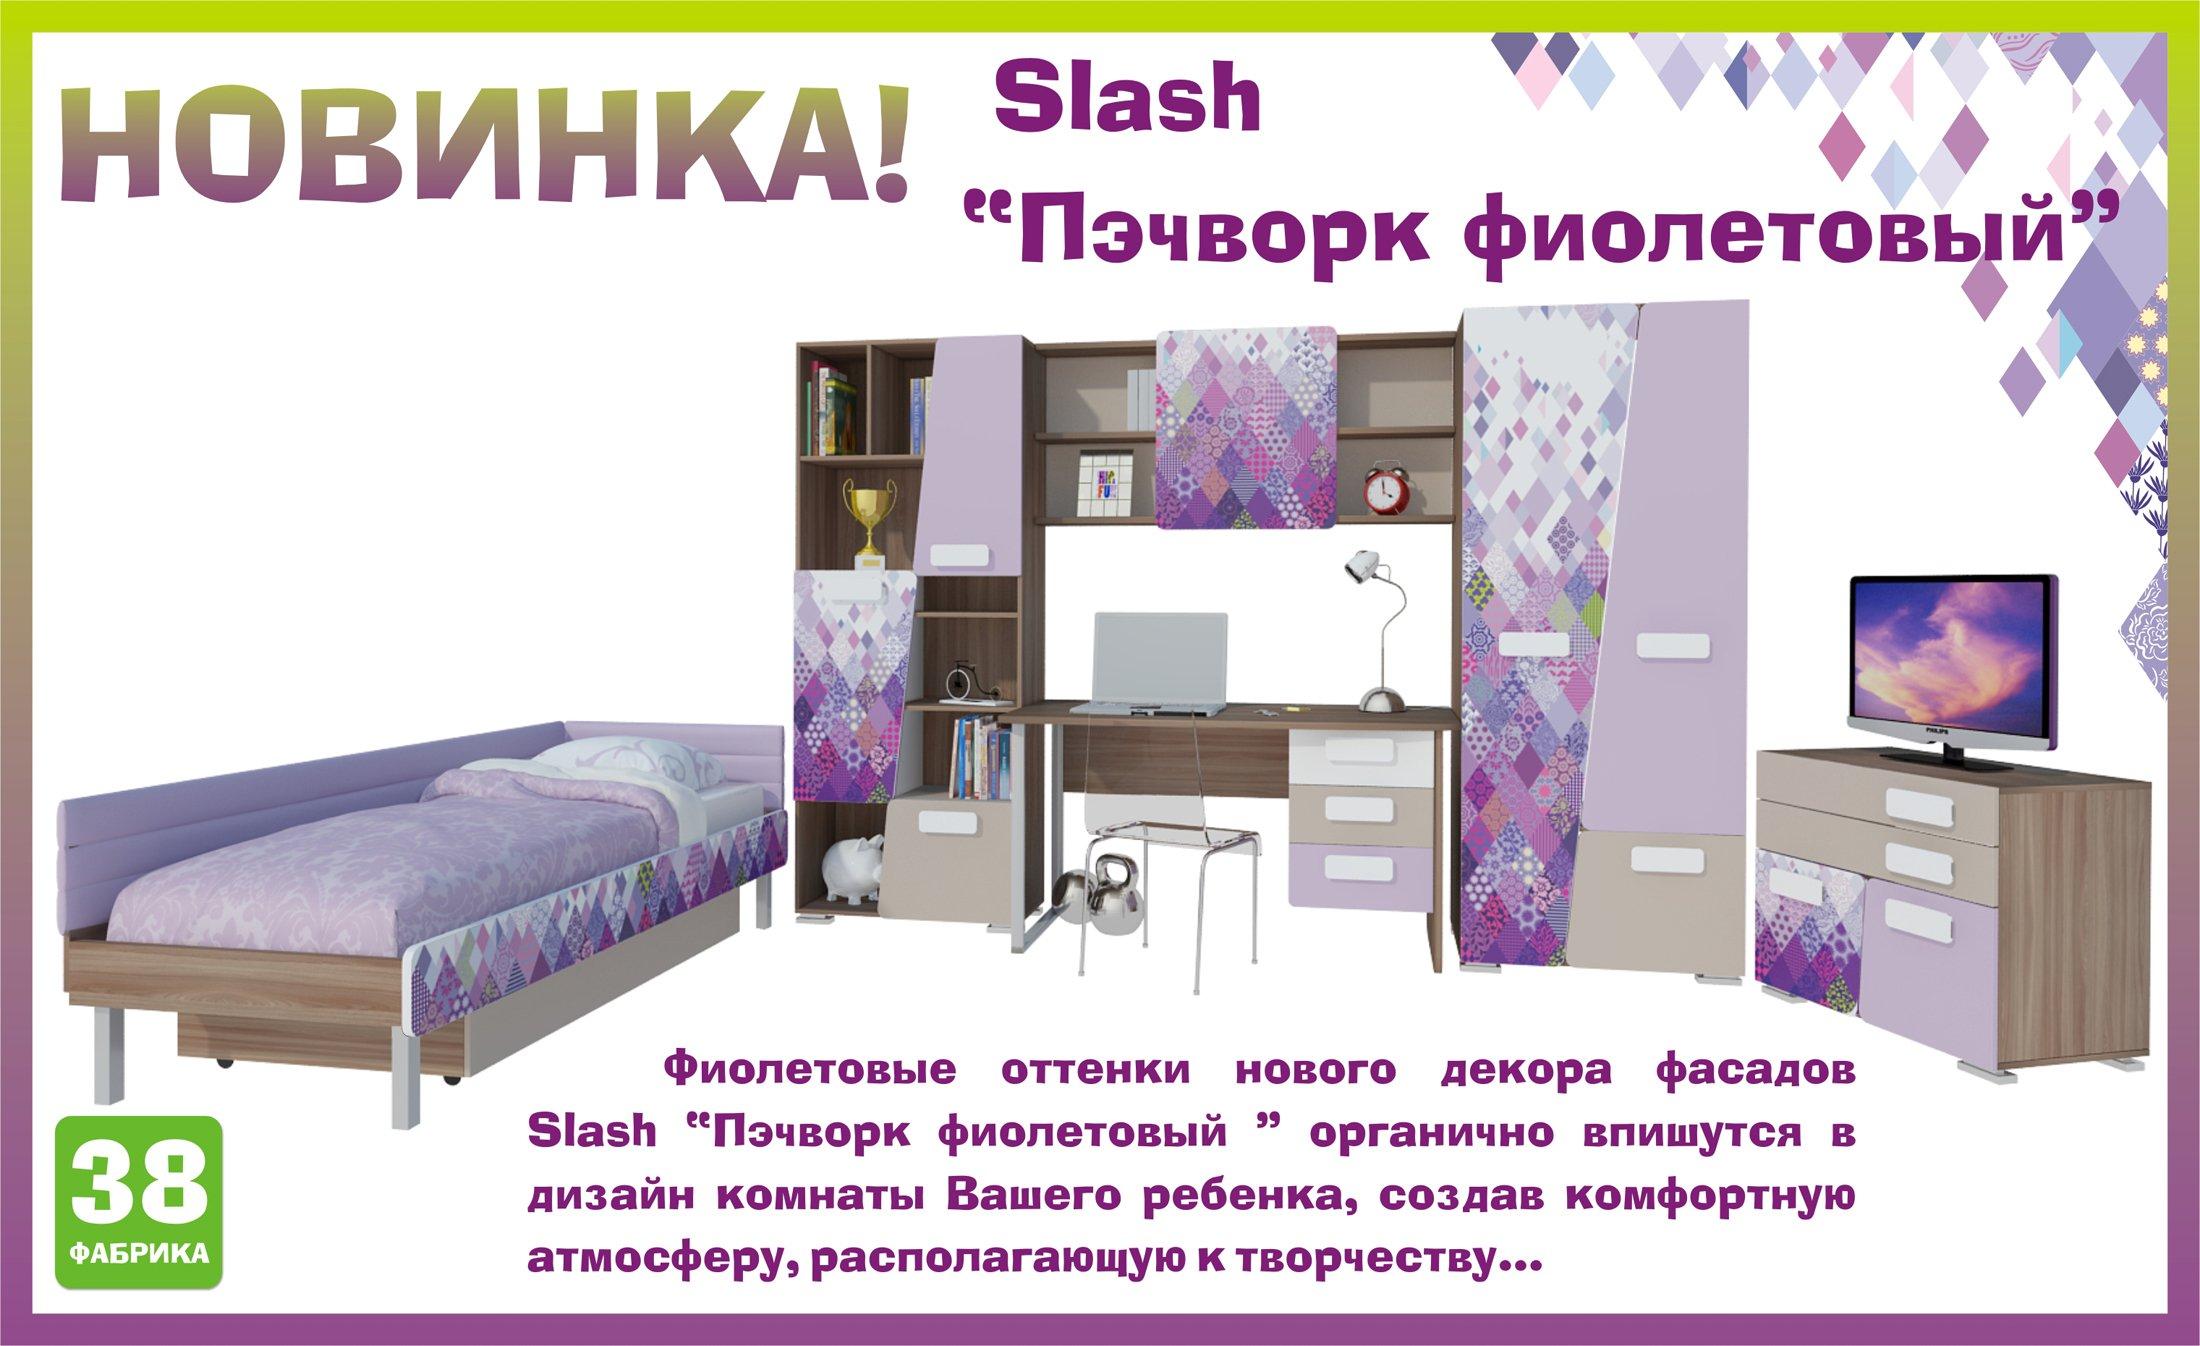 http://online-magazin-mebeli.ru/images/upload/817-pyechvork-fioletovyj.jpg